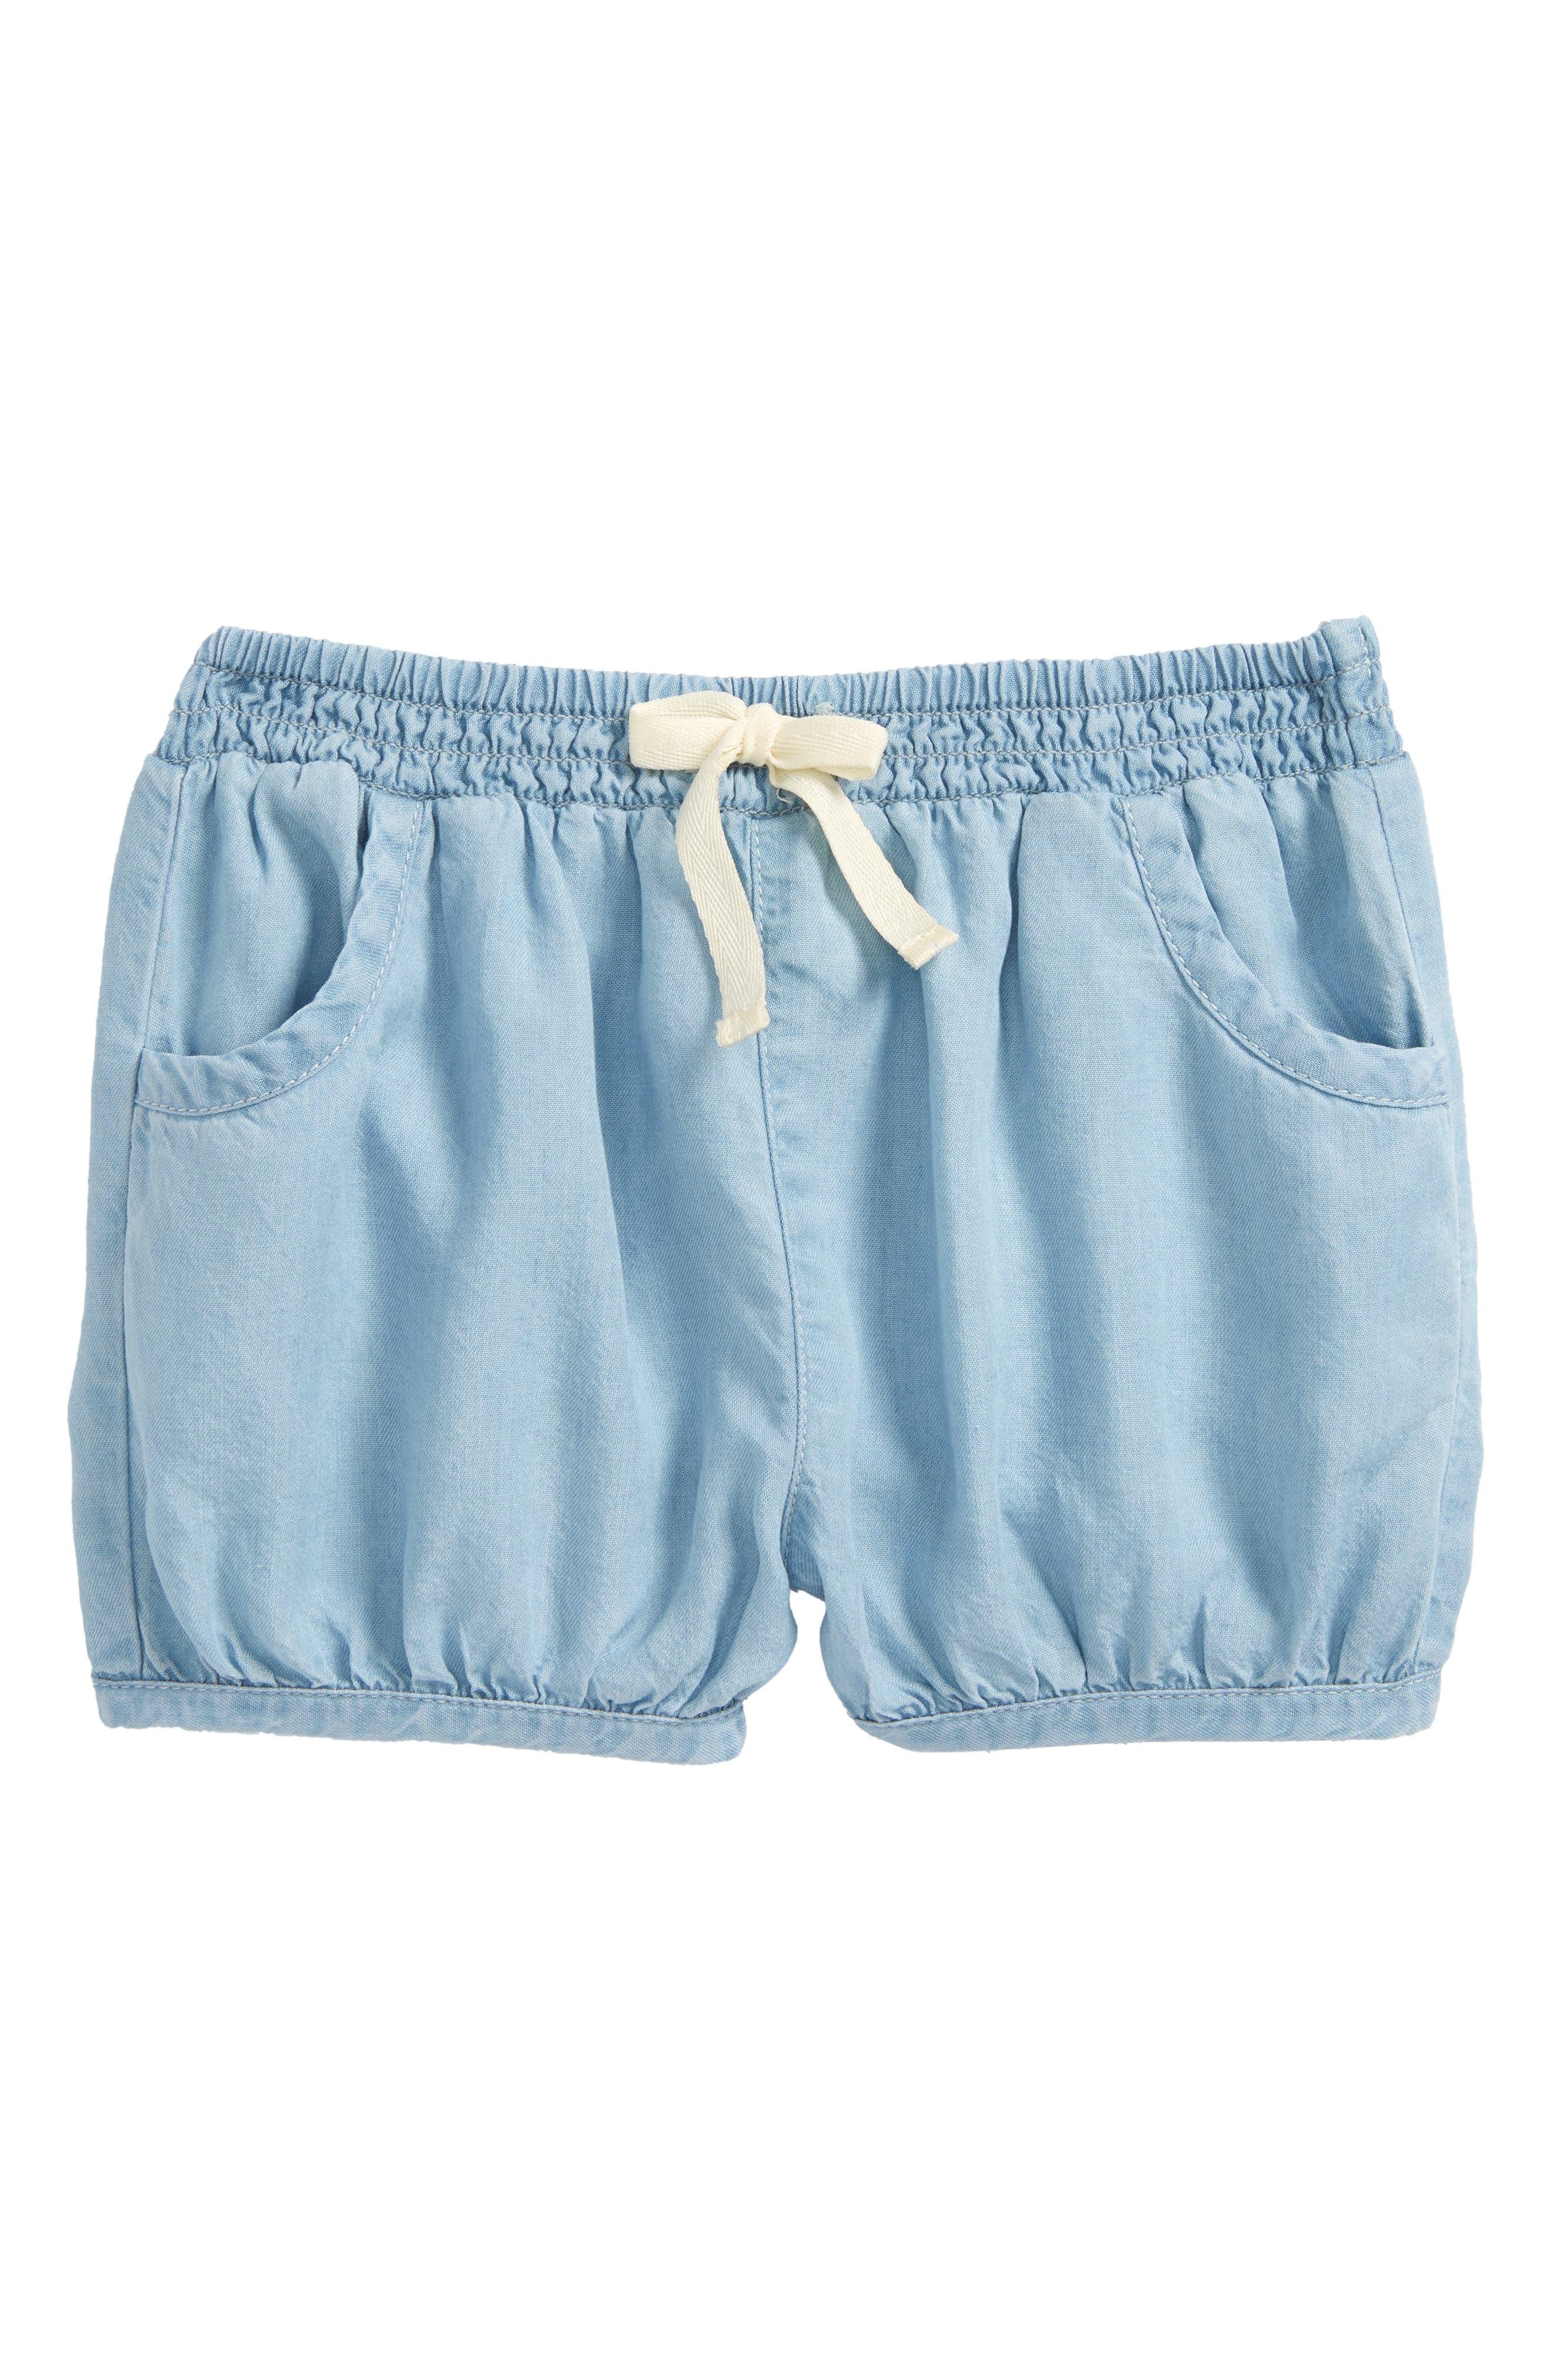 Essential Shorts,                         Main,                         color, Light Blue Wash